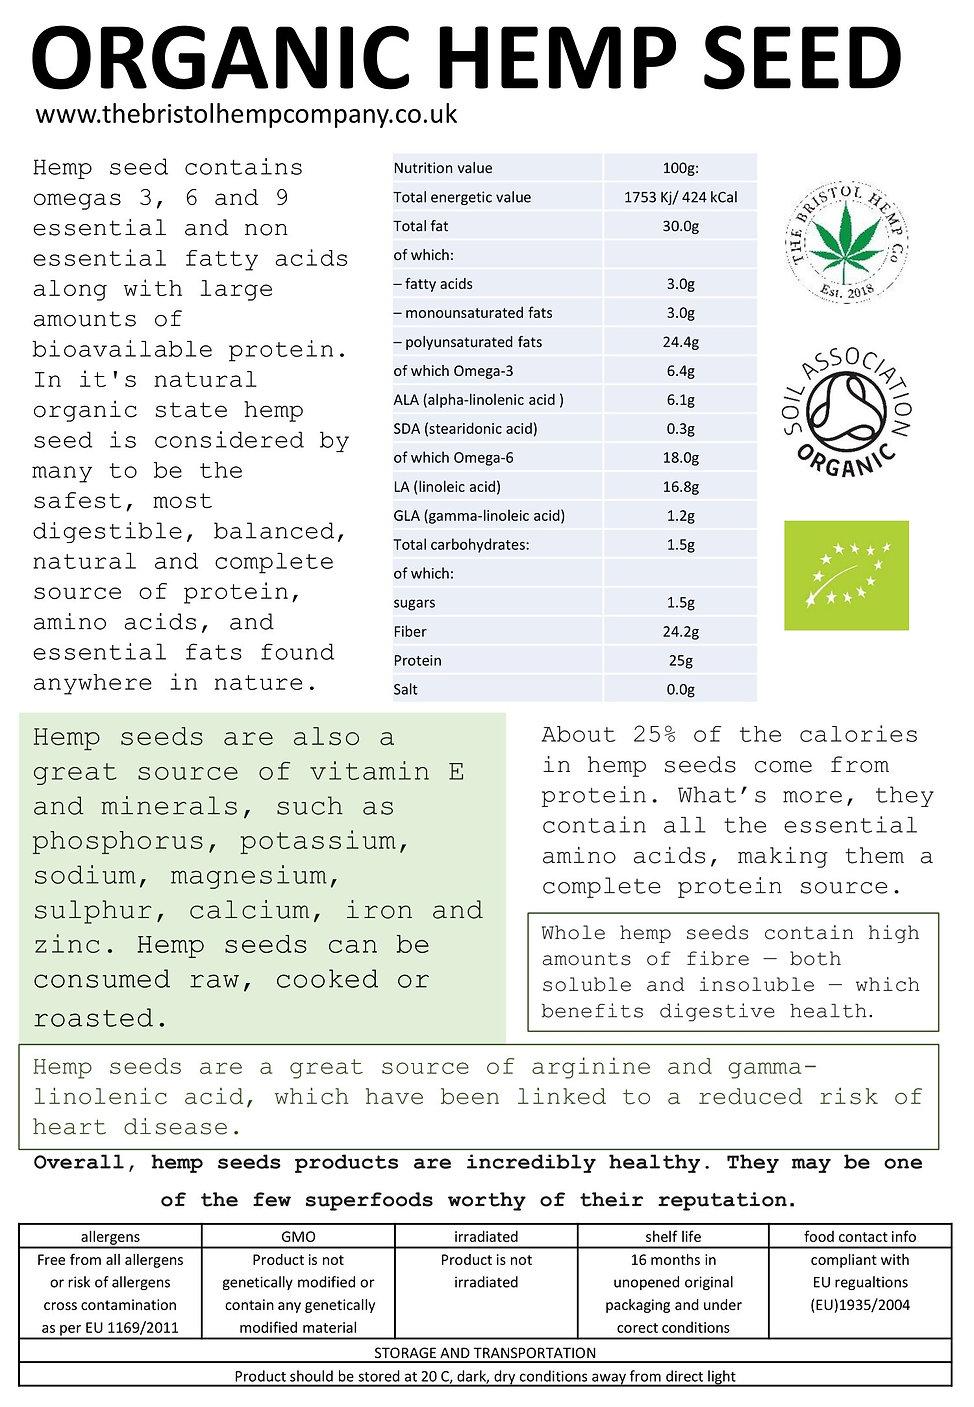 hemp seed description BHC.jpg